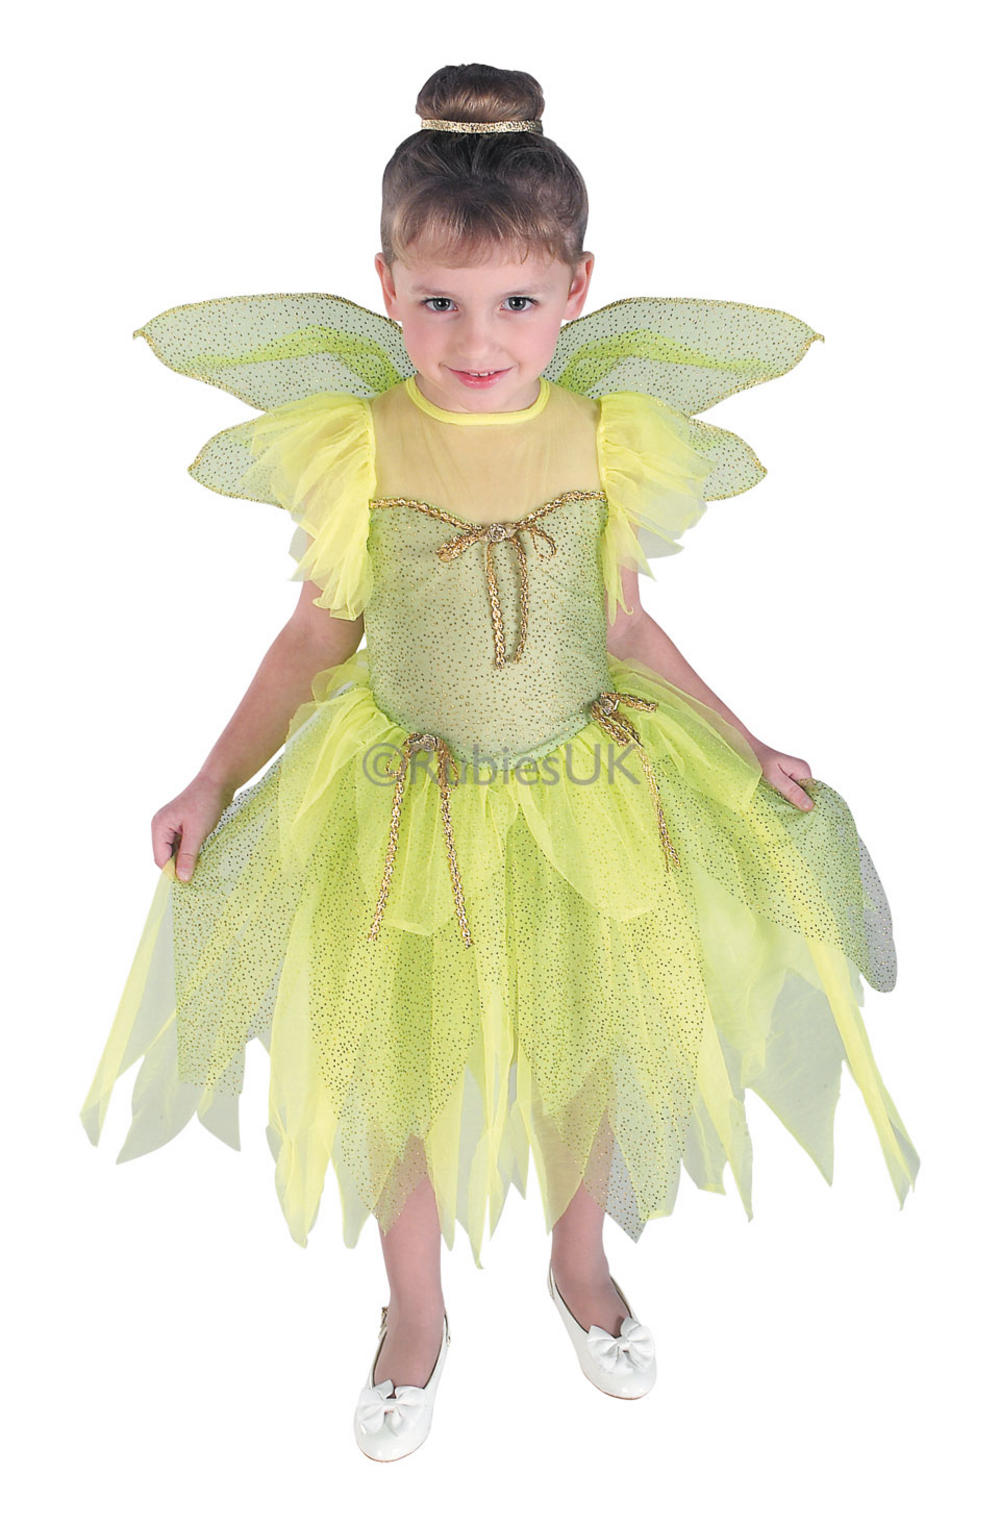 Girls Pretty Pixie Costume